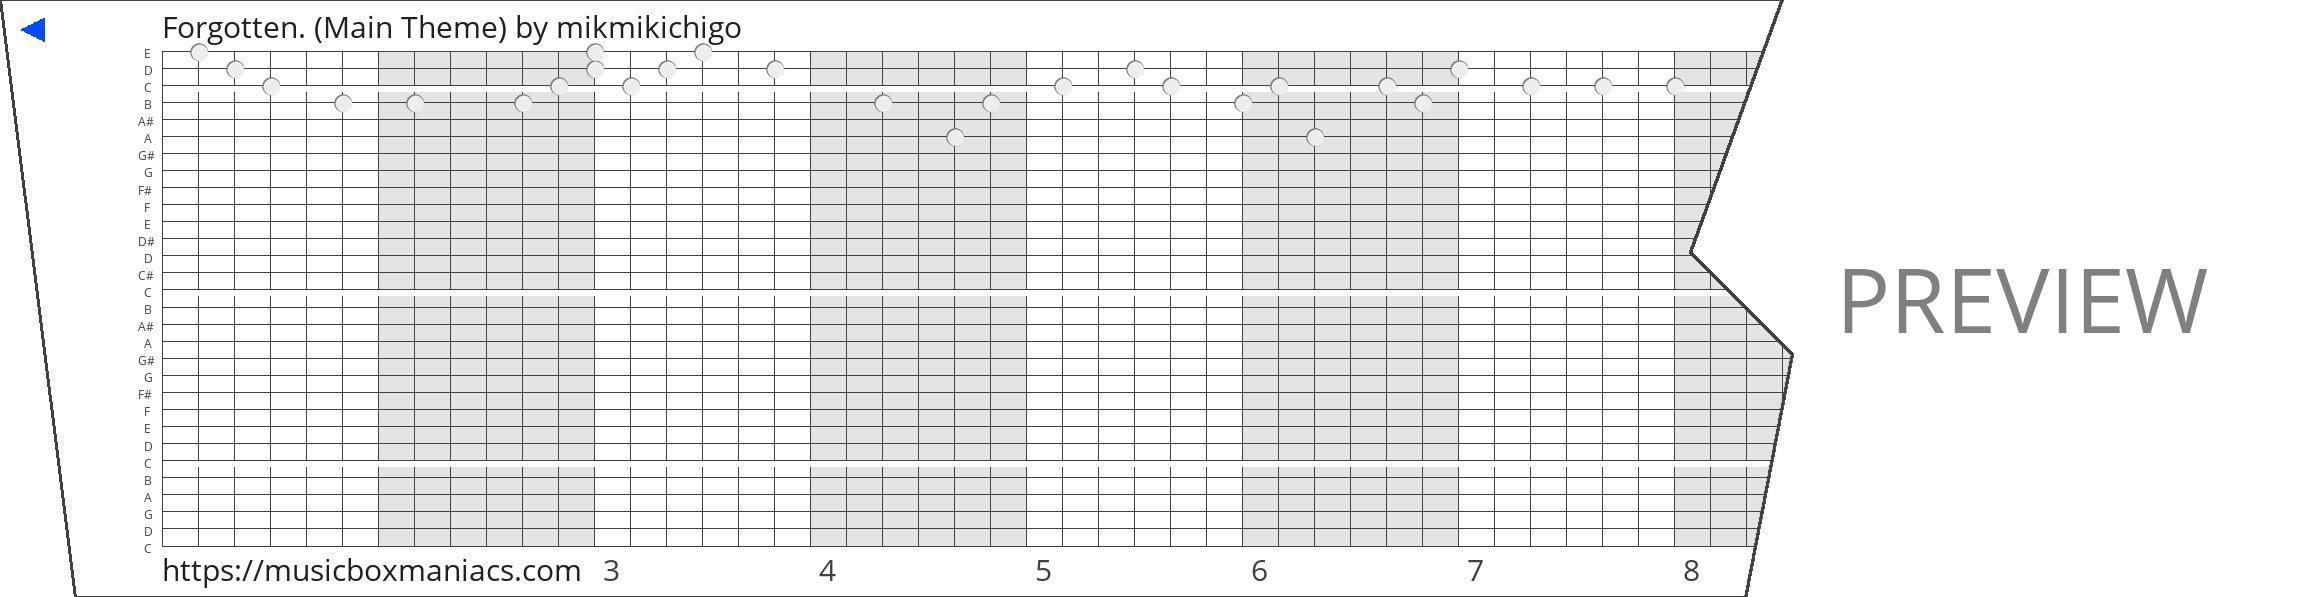 Forgotten. (Main Theme) 30 note music box paper strip